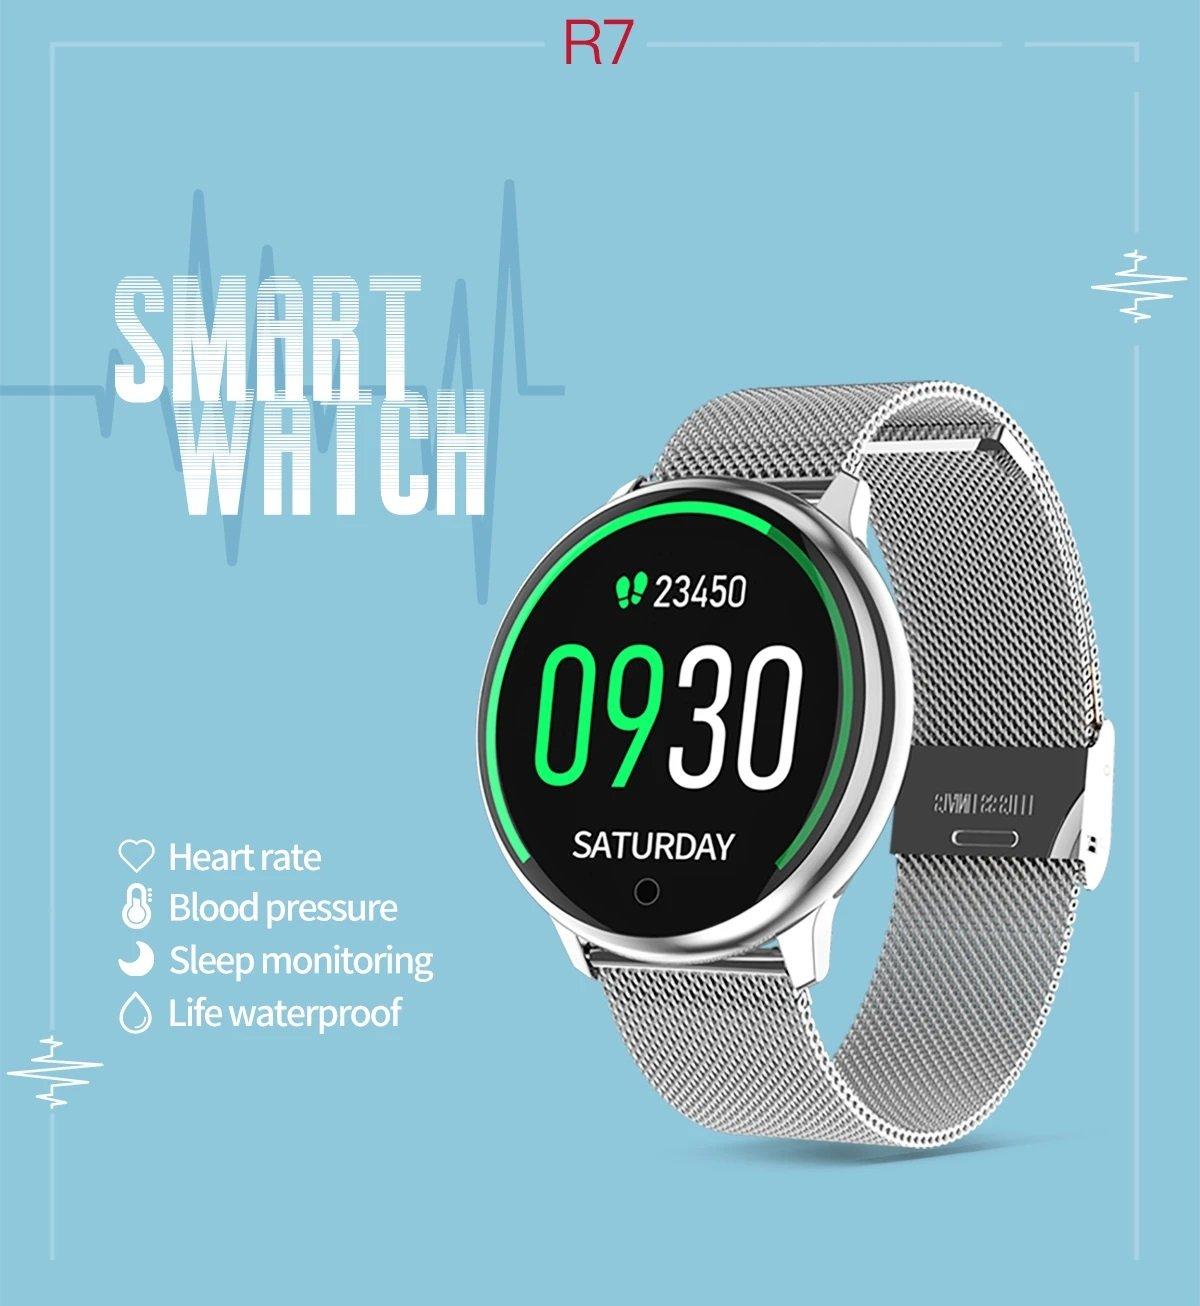 R7 Smart Fitness Bracelet Heart Rate | Blood Pressure | Monitor + Activity Tracker